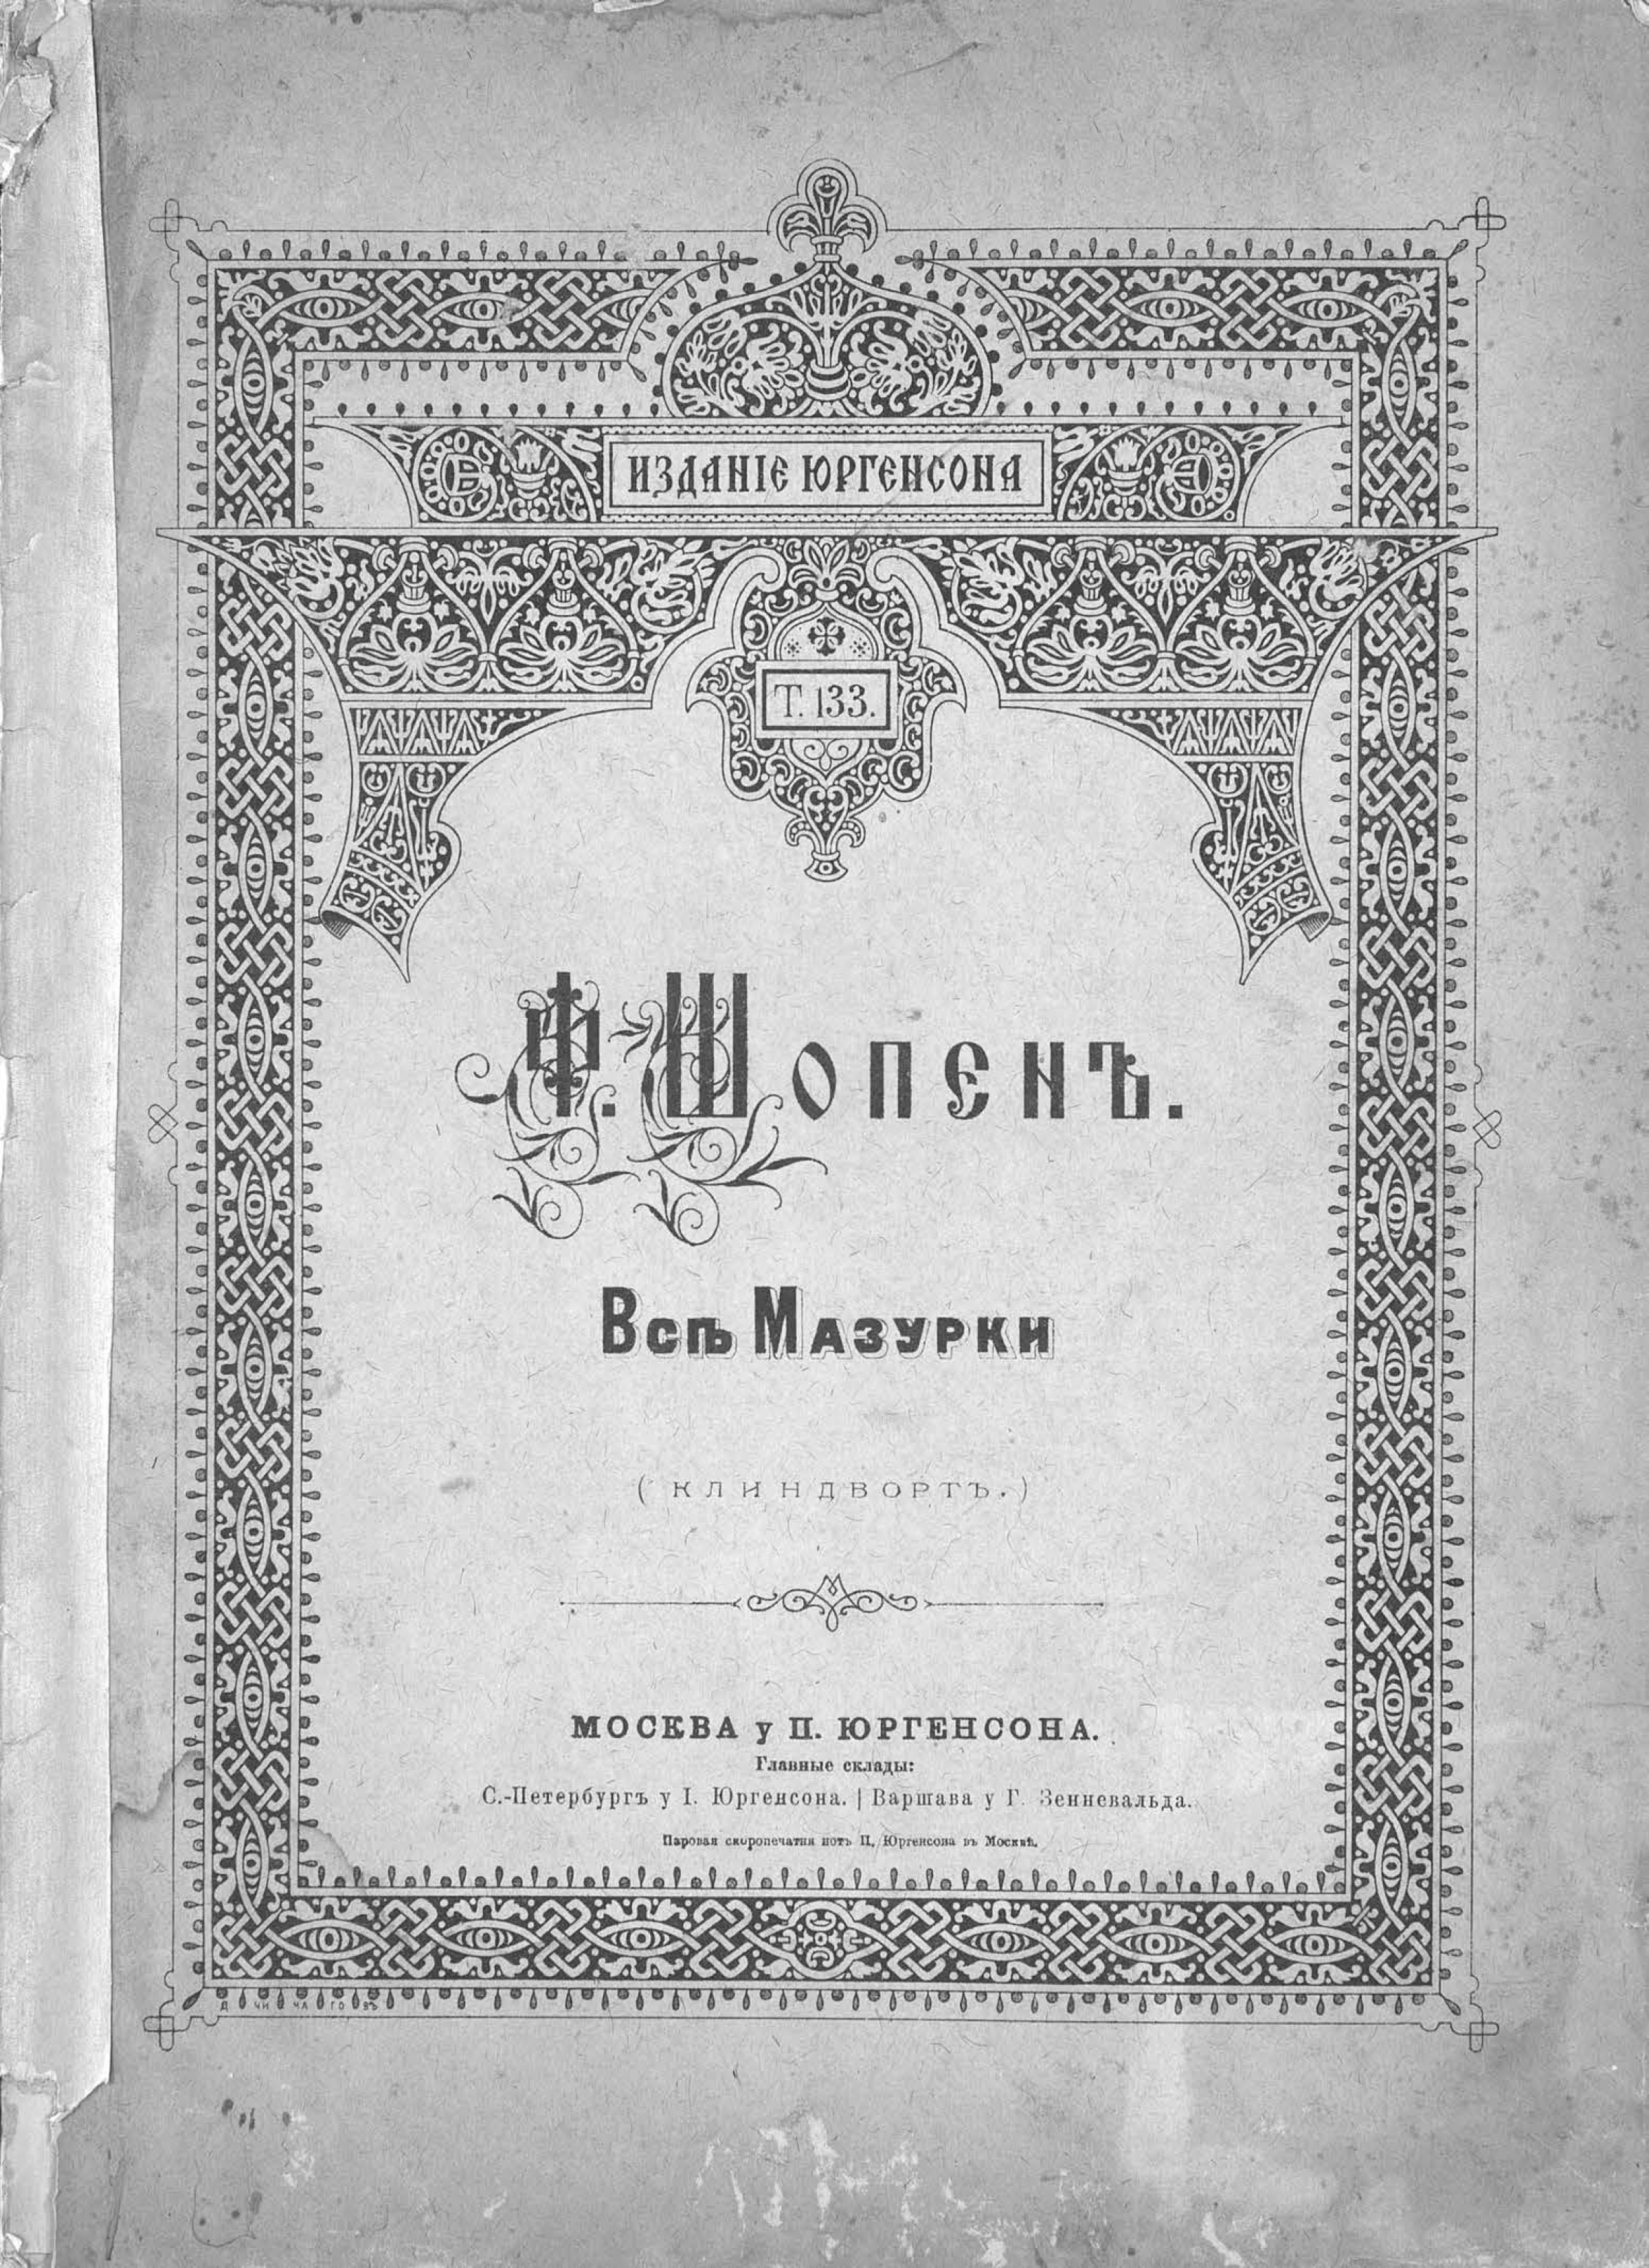 Фредерик Шопен Все мазурки ф шопен ф шопен мазурки для фортепиано